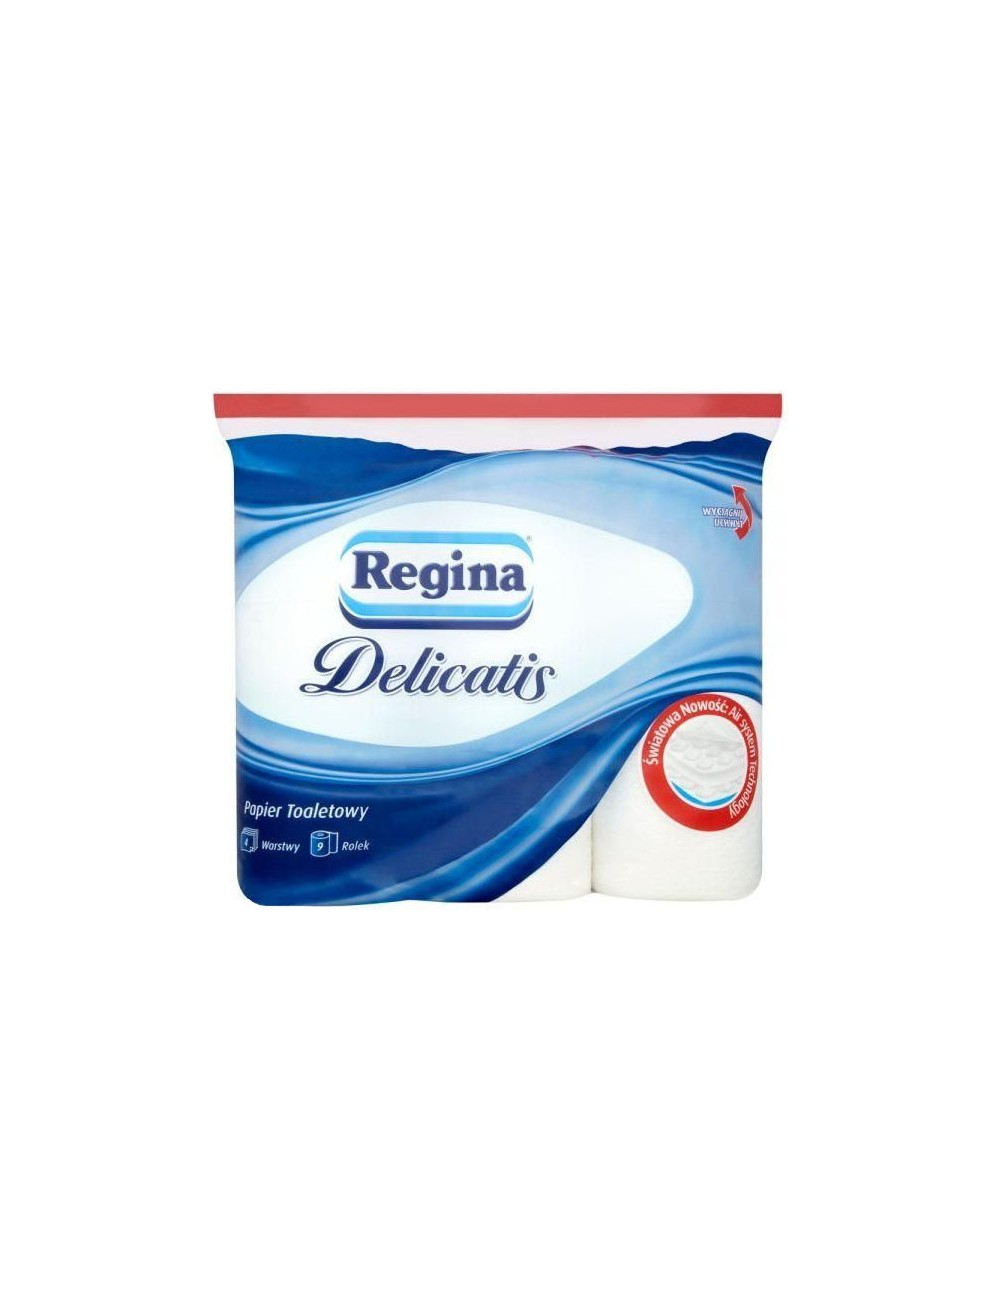 Regina delicatis 9 rolek – papier toaletowy, 4-warstwowy, 100 listków w rolce